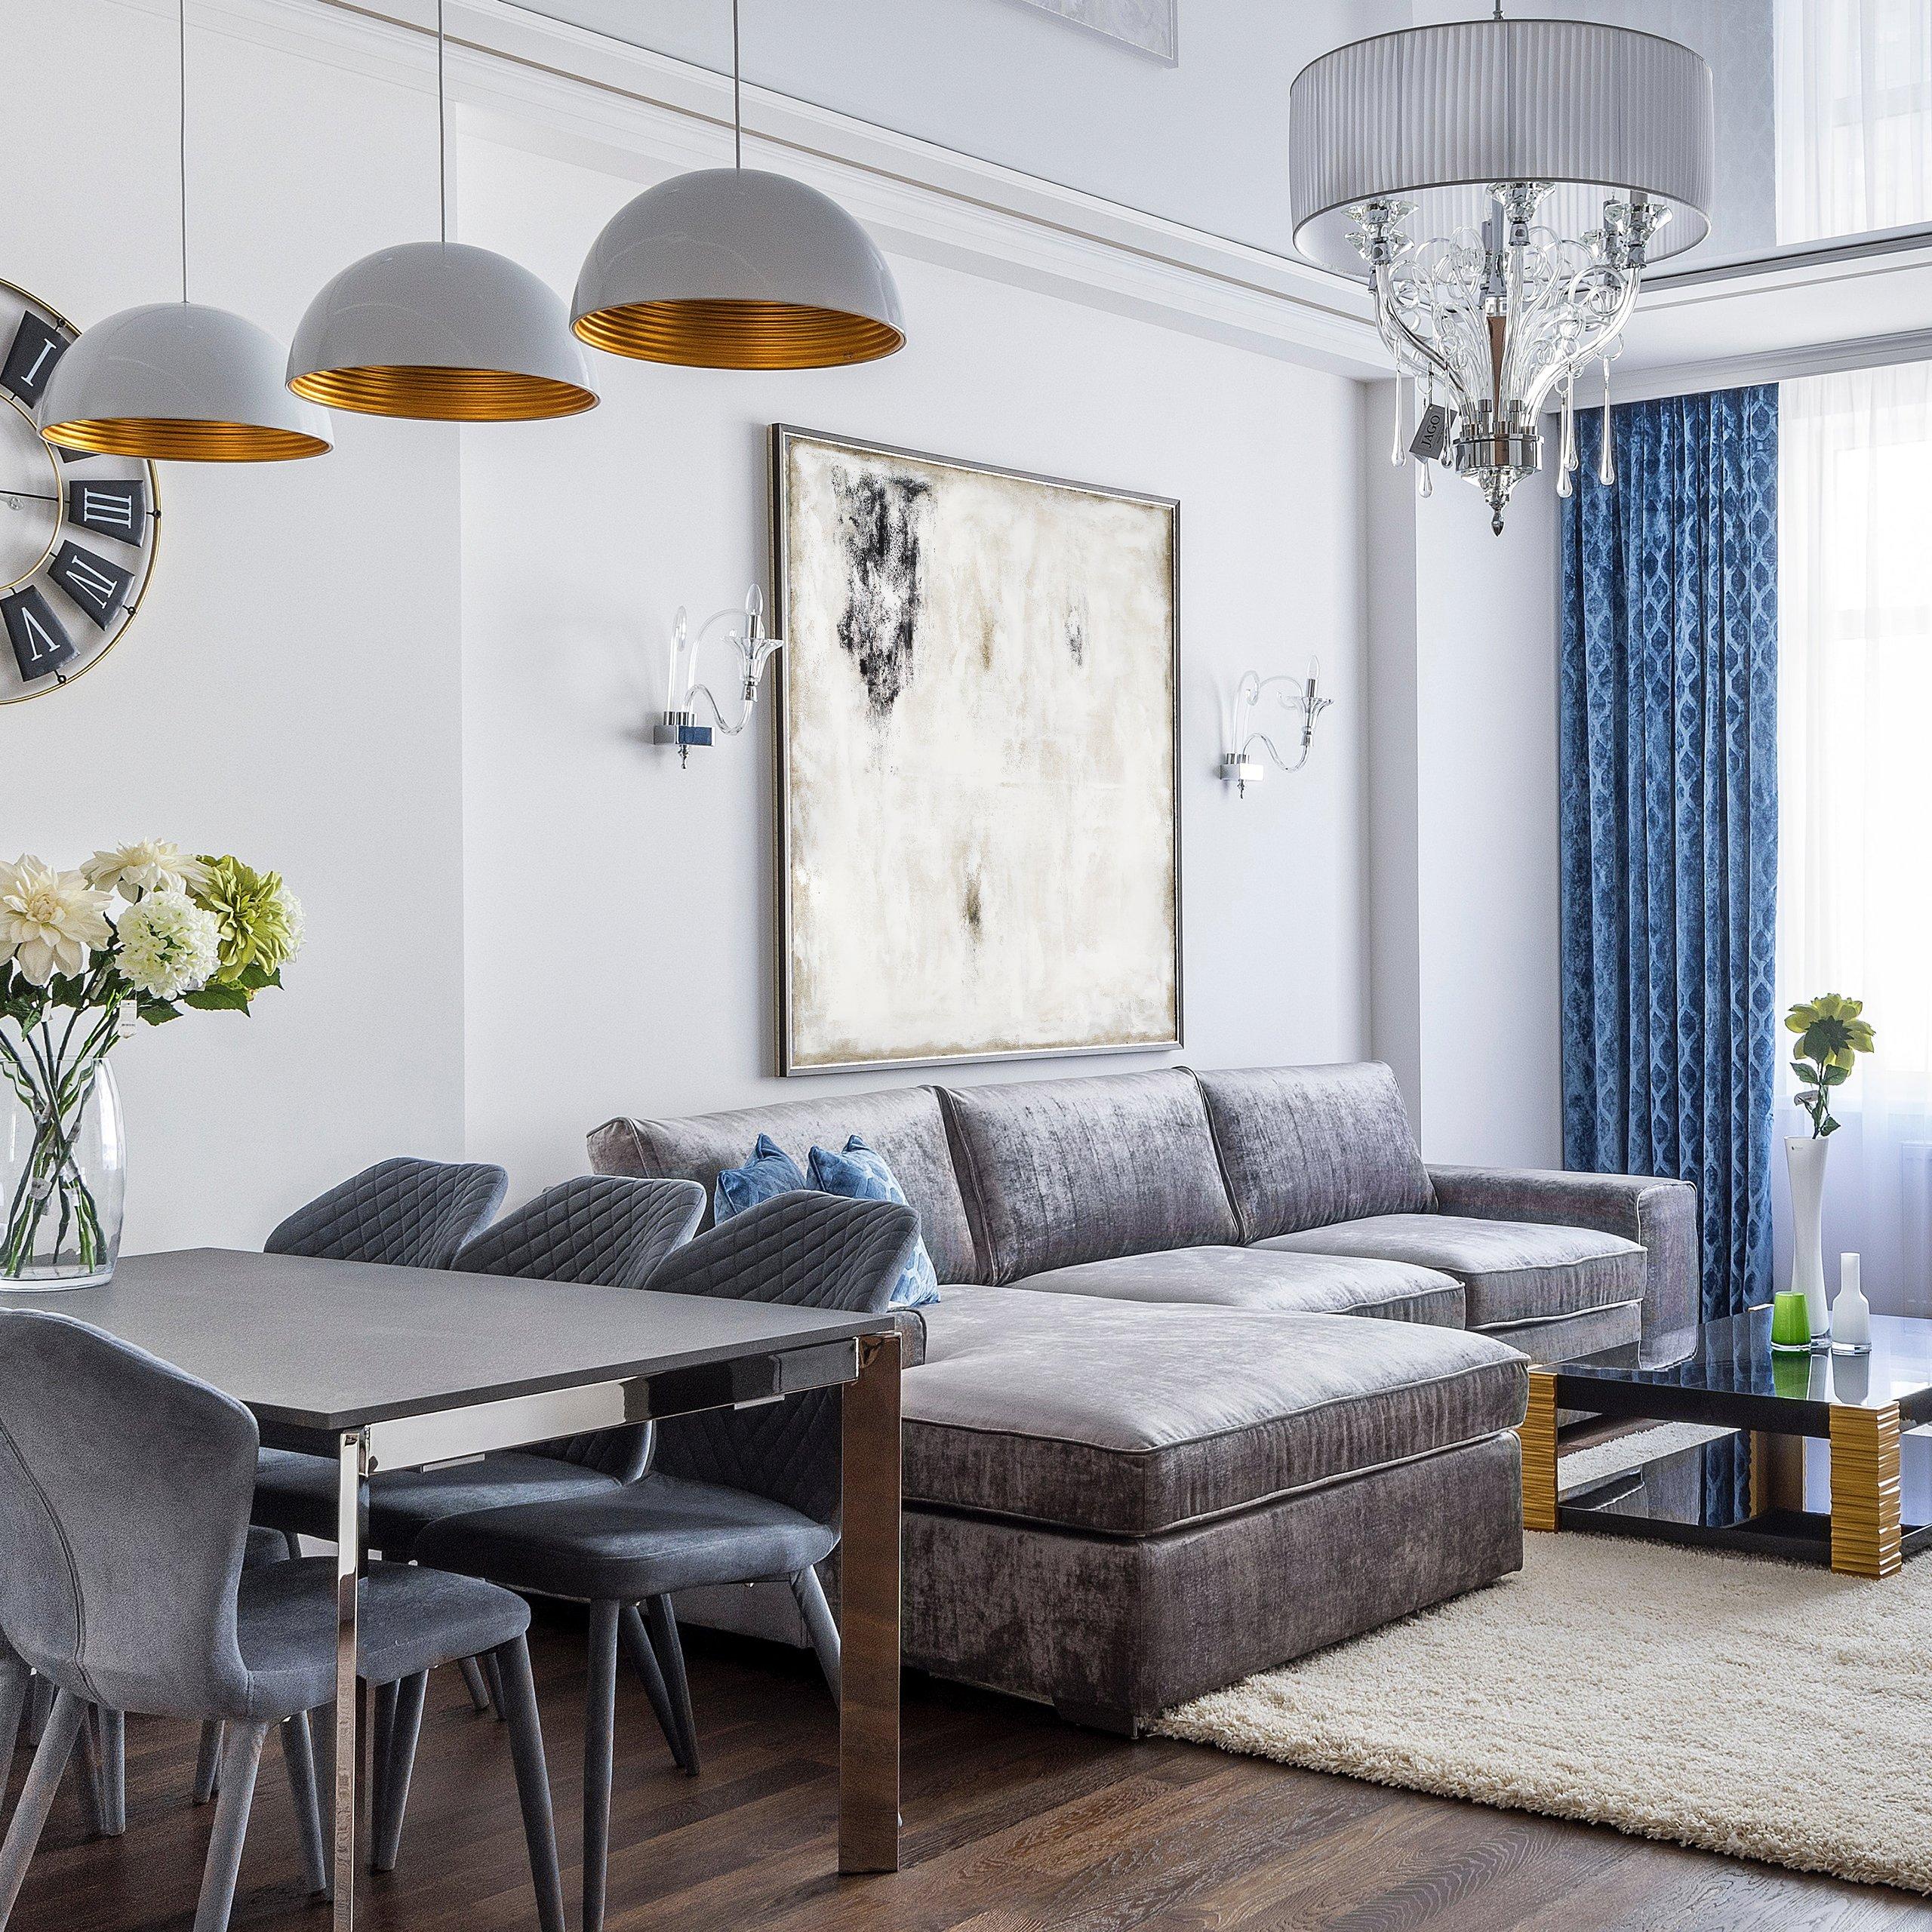 Black and white modern abstract art in modern interior design